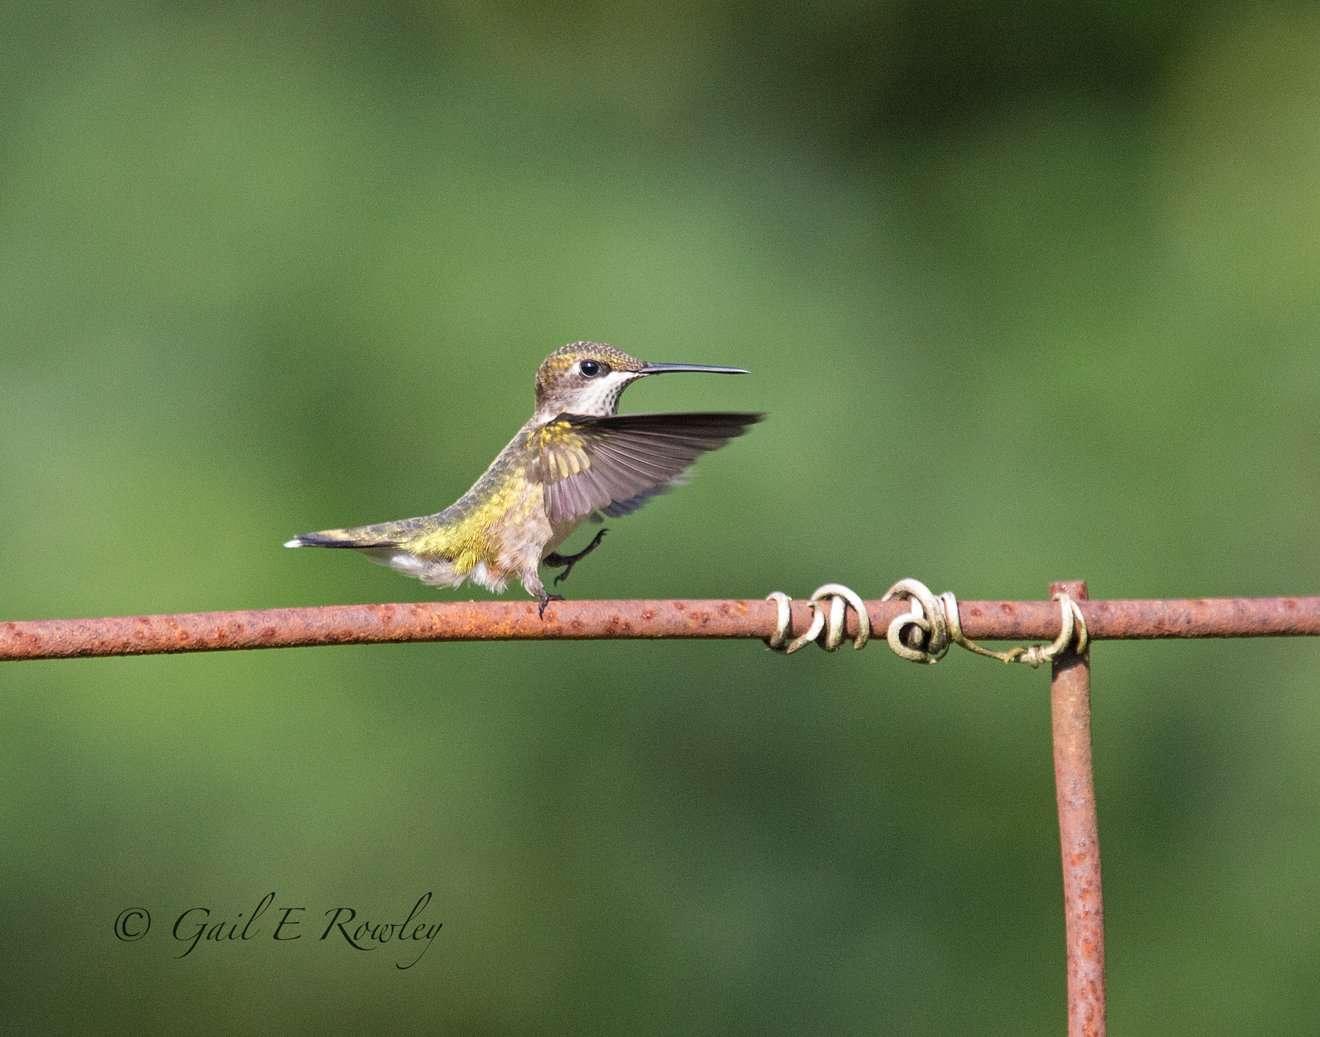 Hummingbird Dancing on Fence